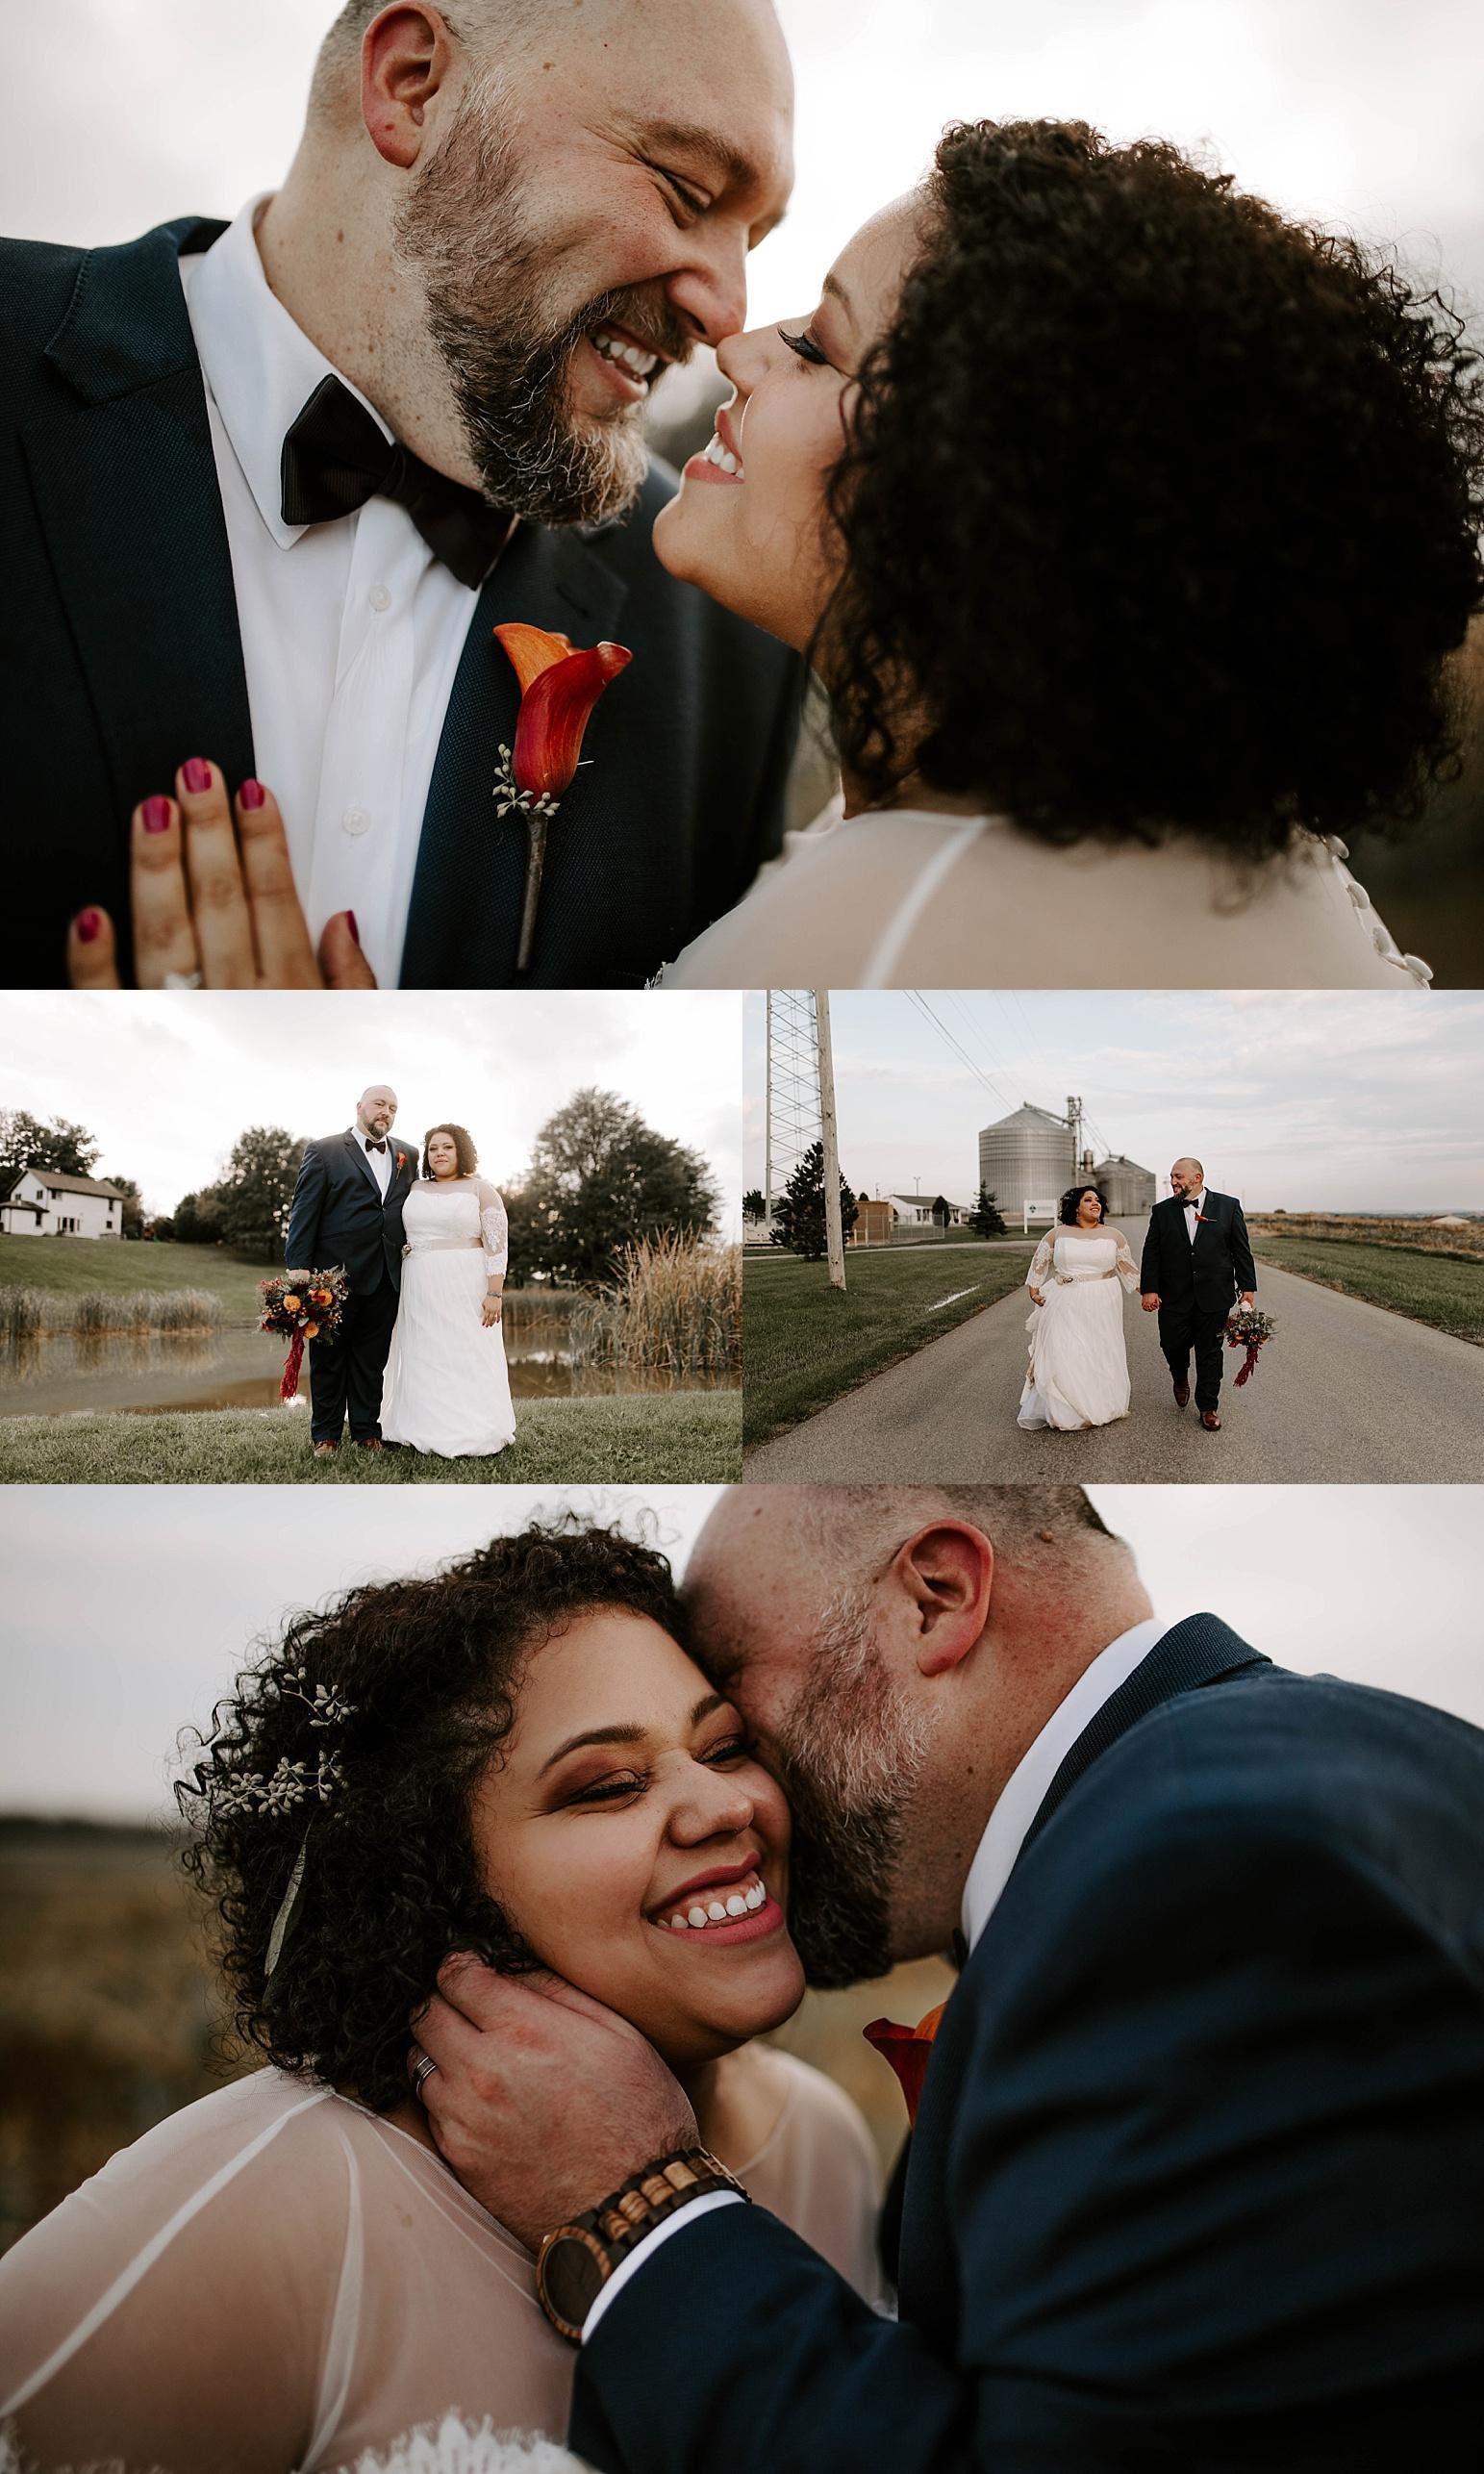 ashley_sara_photography_pittsburgh-wedding-photographer_ohio-wedding-photographer_destination-wedding-photographer6.jpg